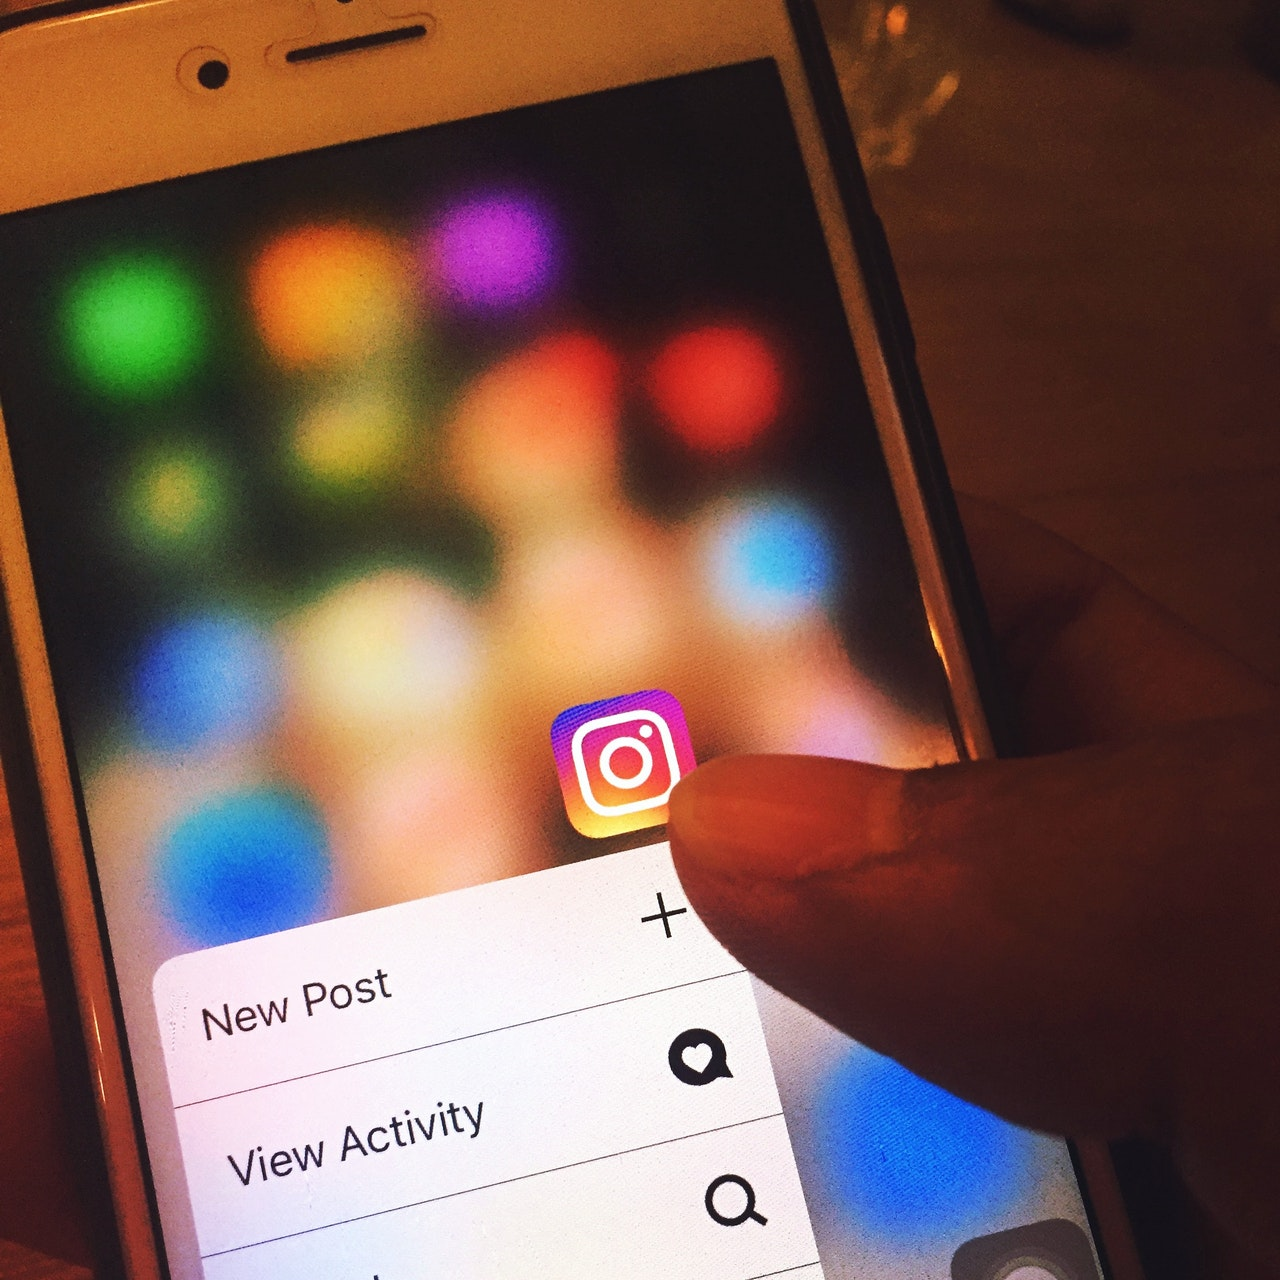 Instagram not posting to facebook